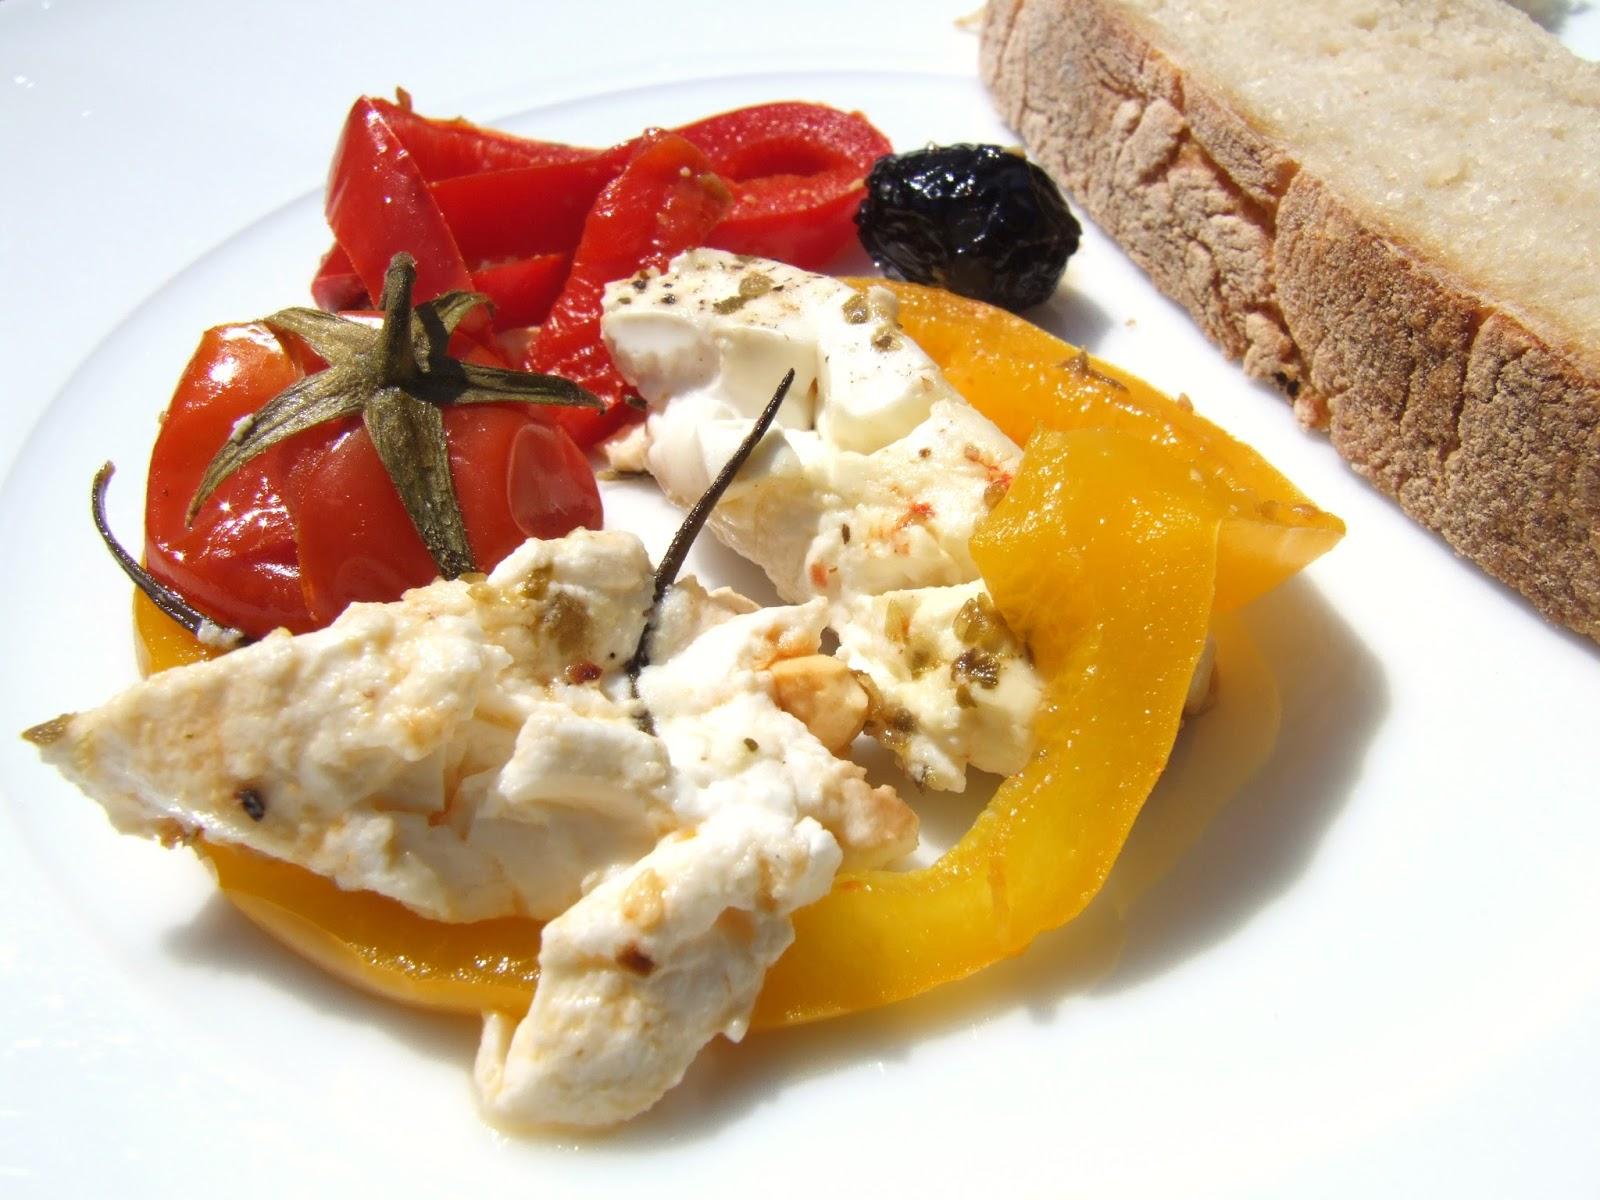 Cooking julia papillote de salade grecque au barbecue - Idee originale barbecue ...